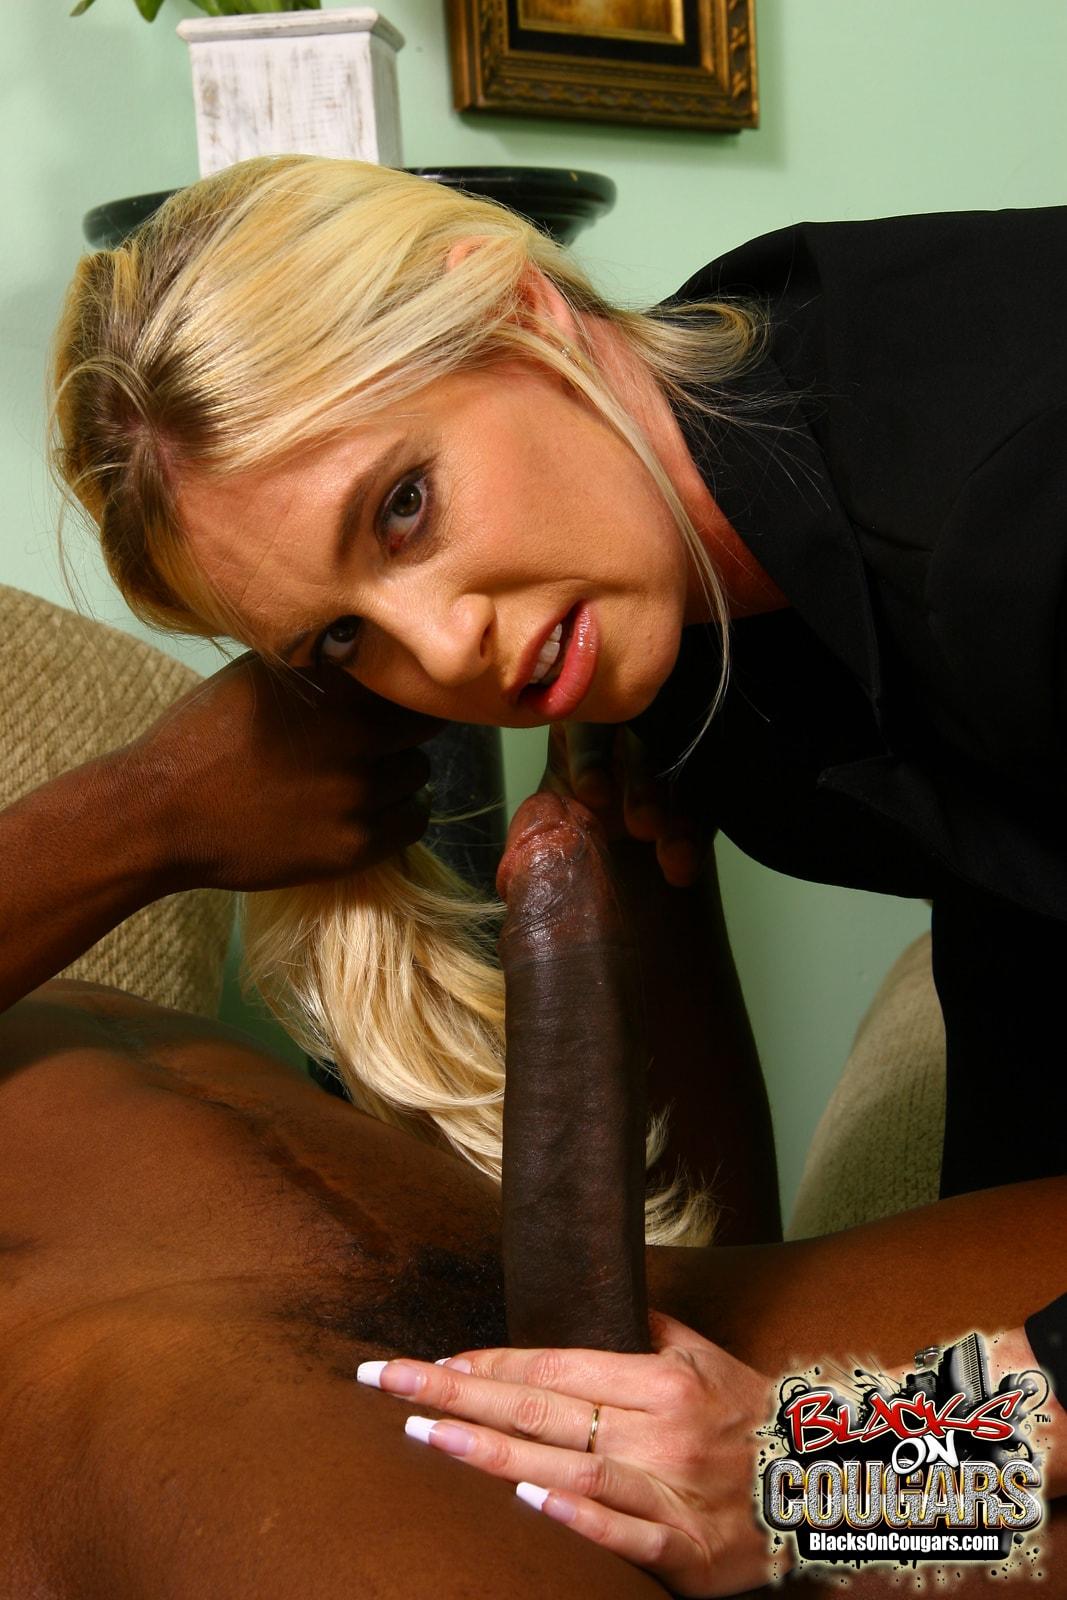 Dogfart '- Blacks On Cougars' starring Debbie Dial (Photo 12)